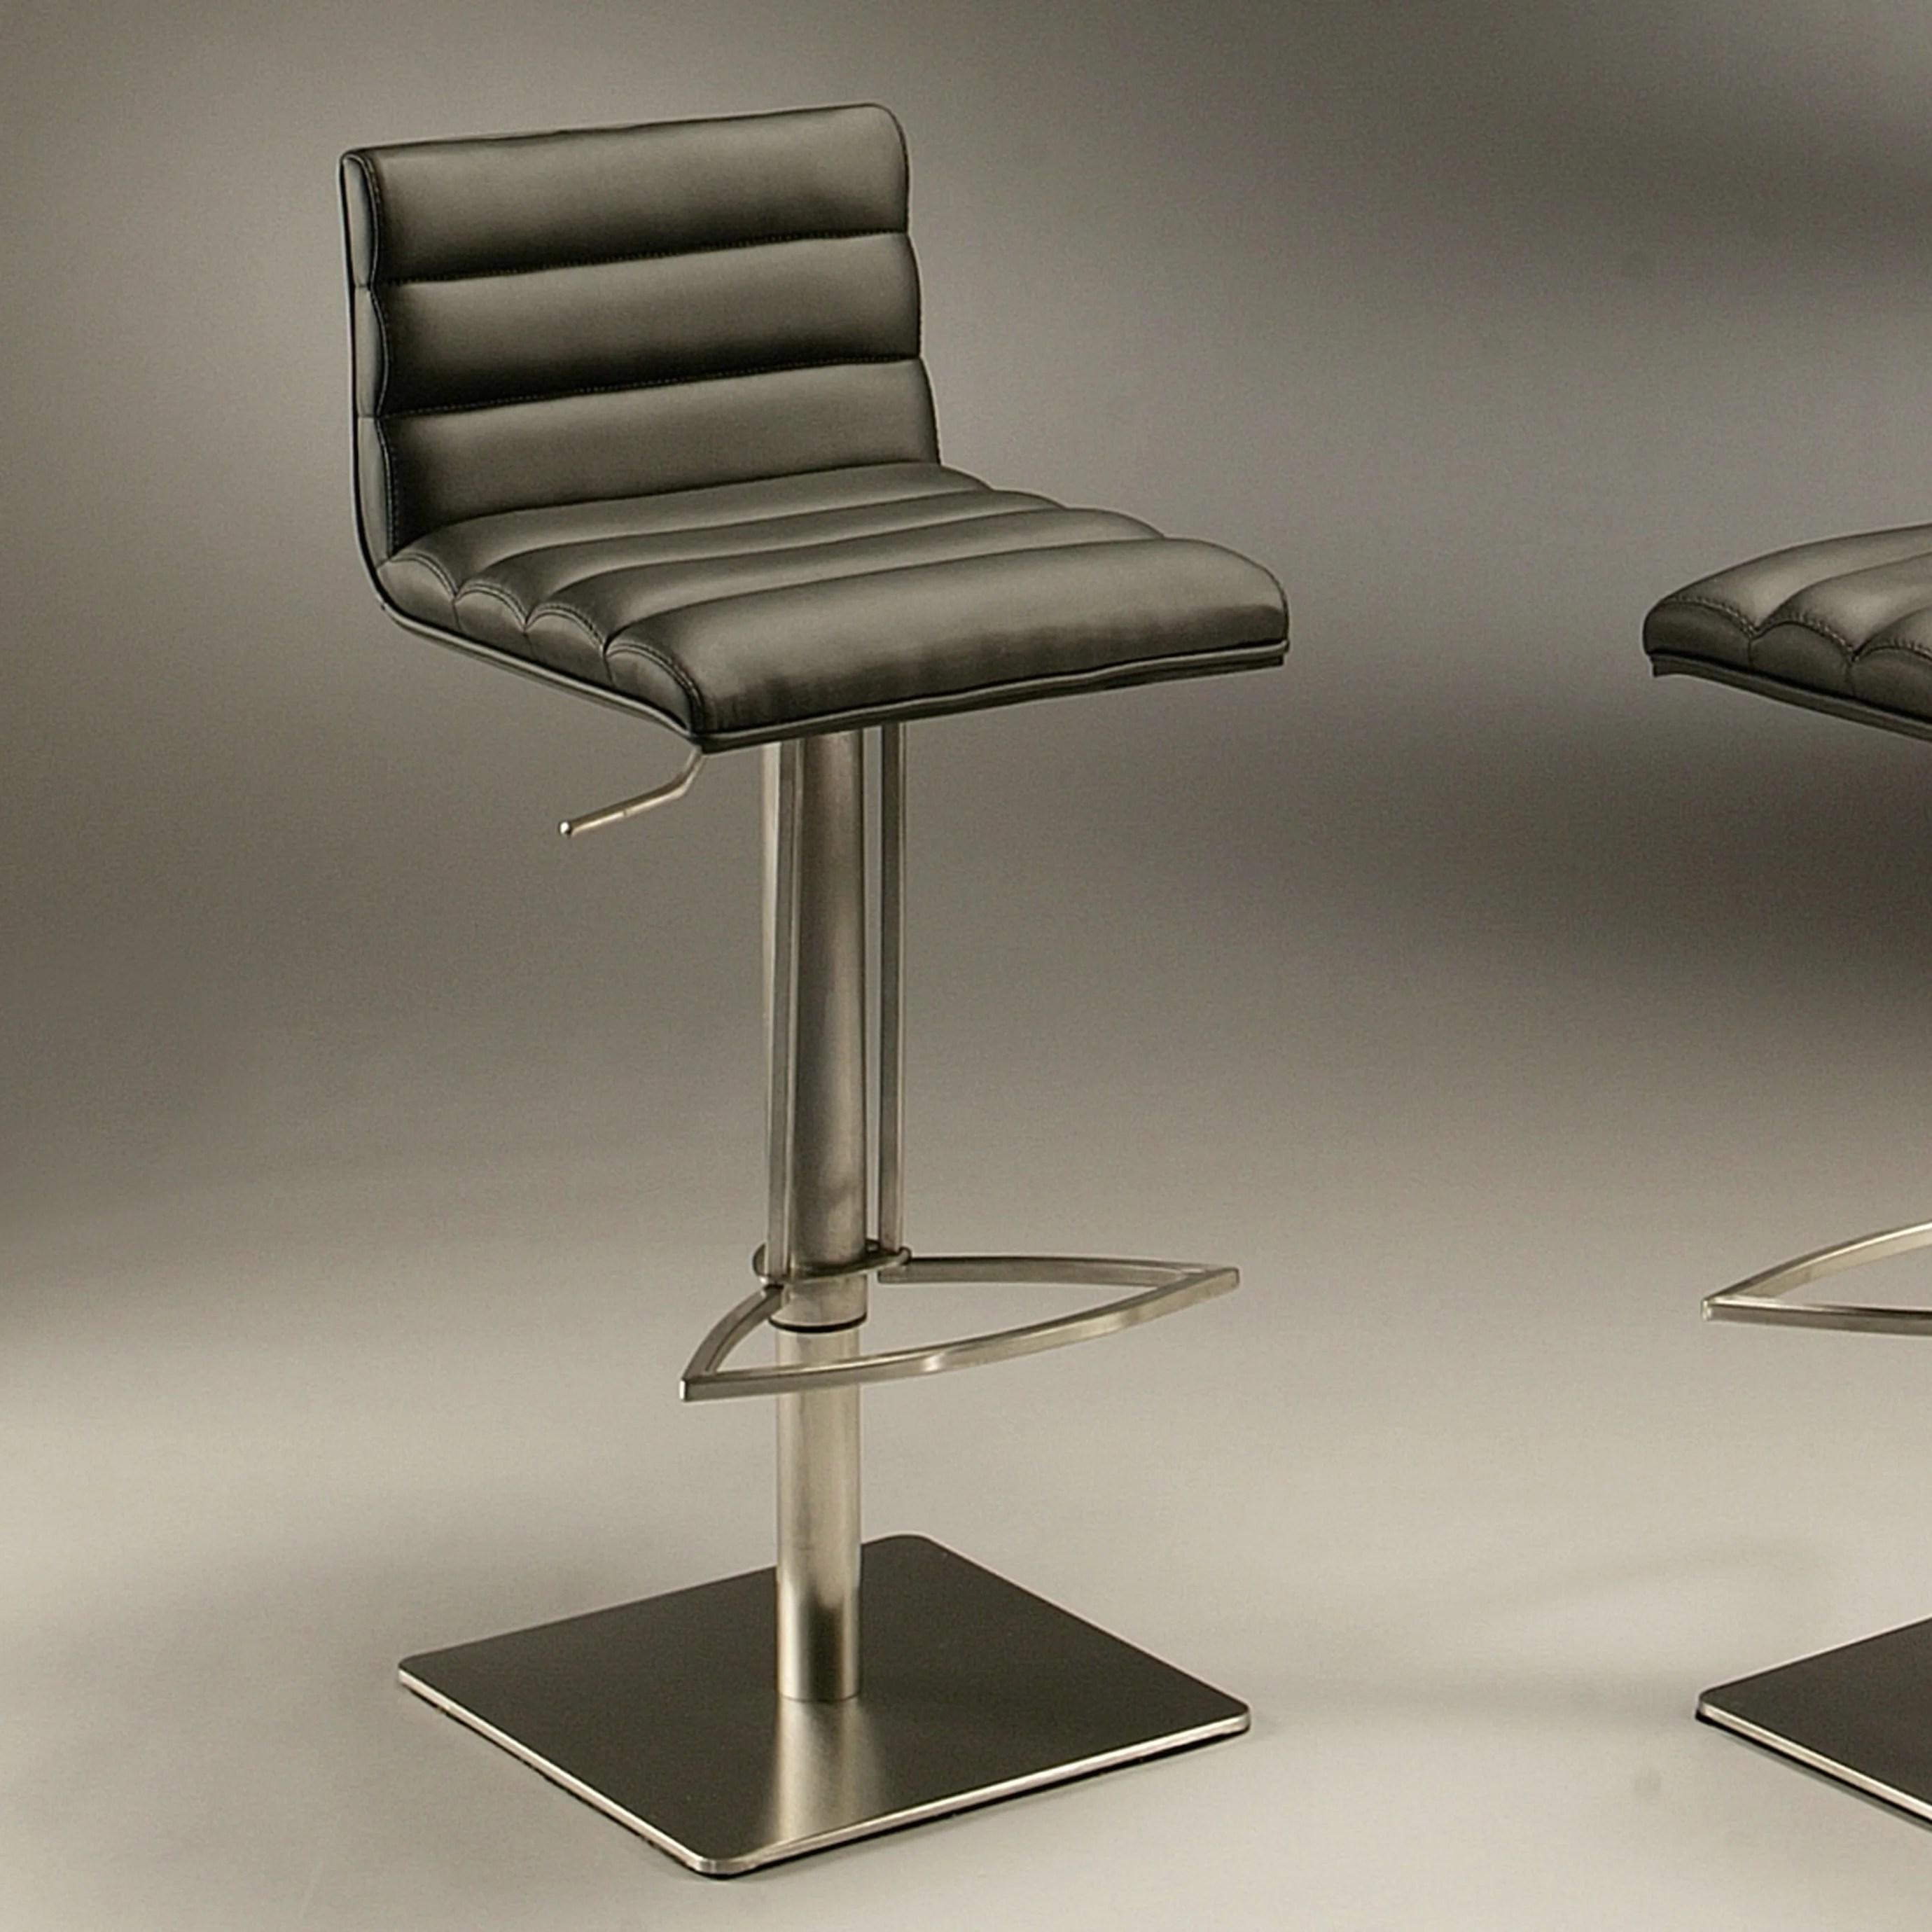 stool chair dubai fisher price travel high impacterra adjustable height swivel bar